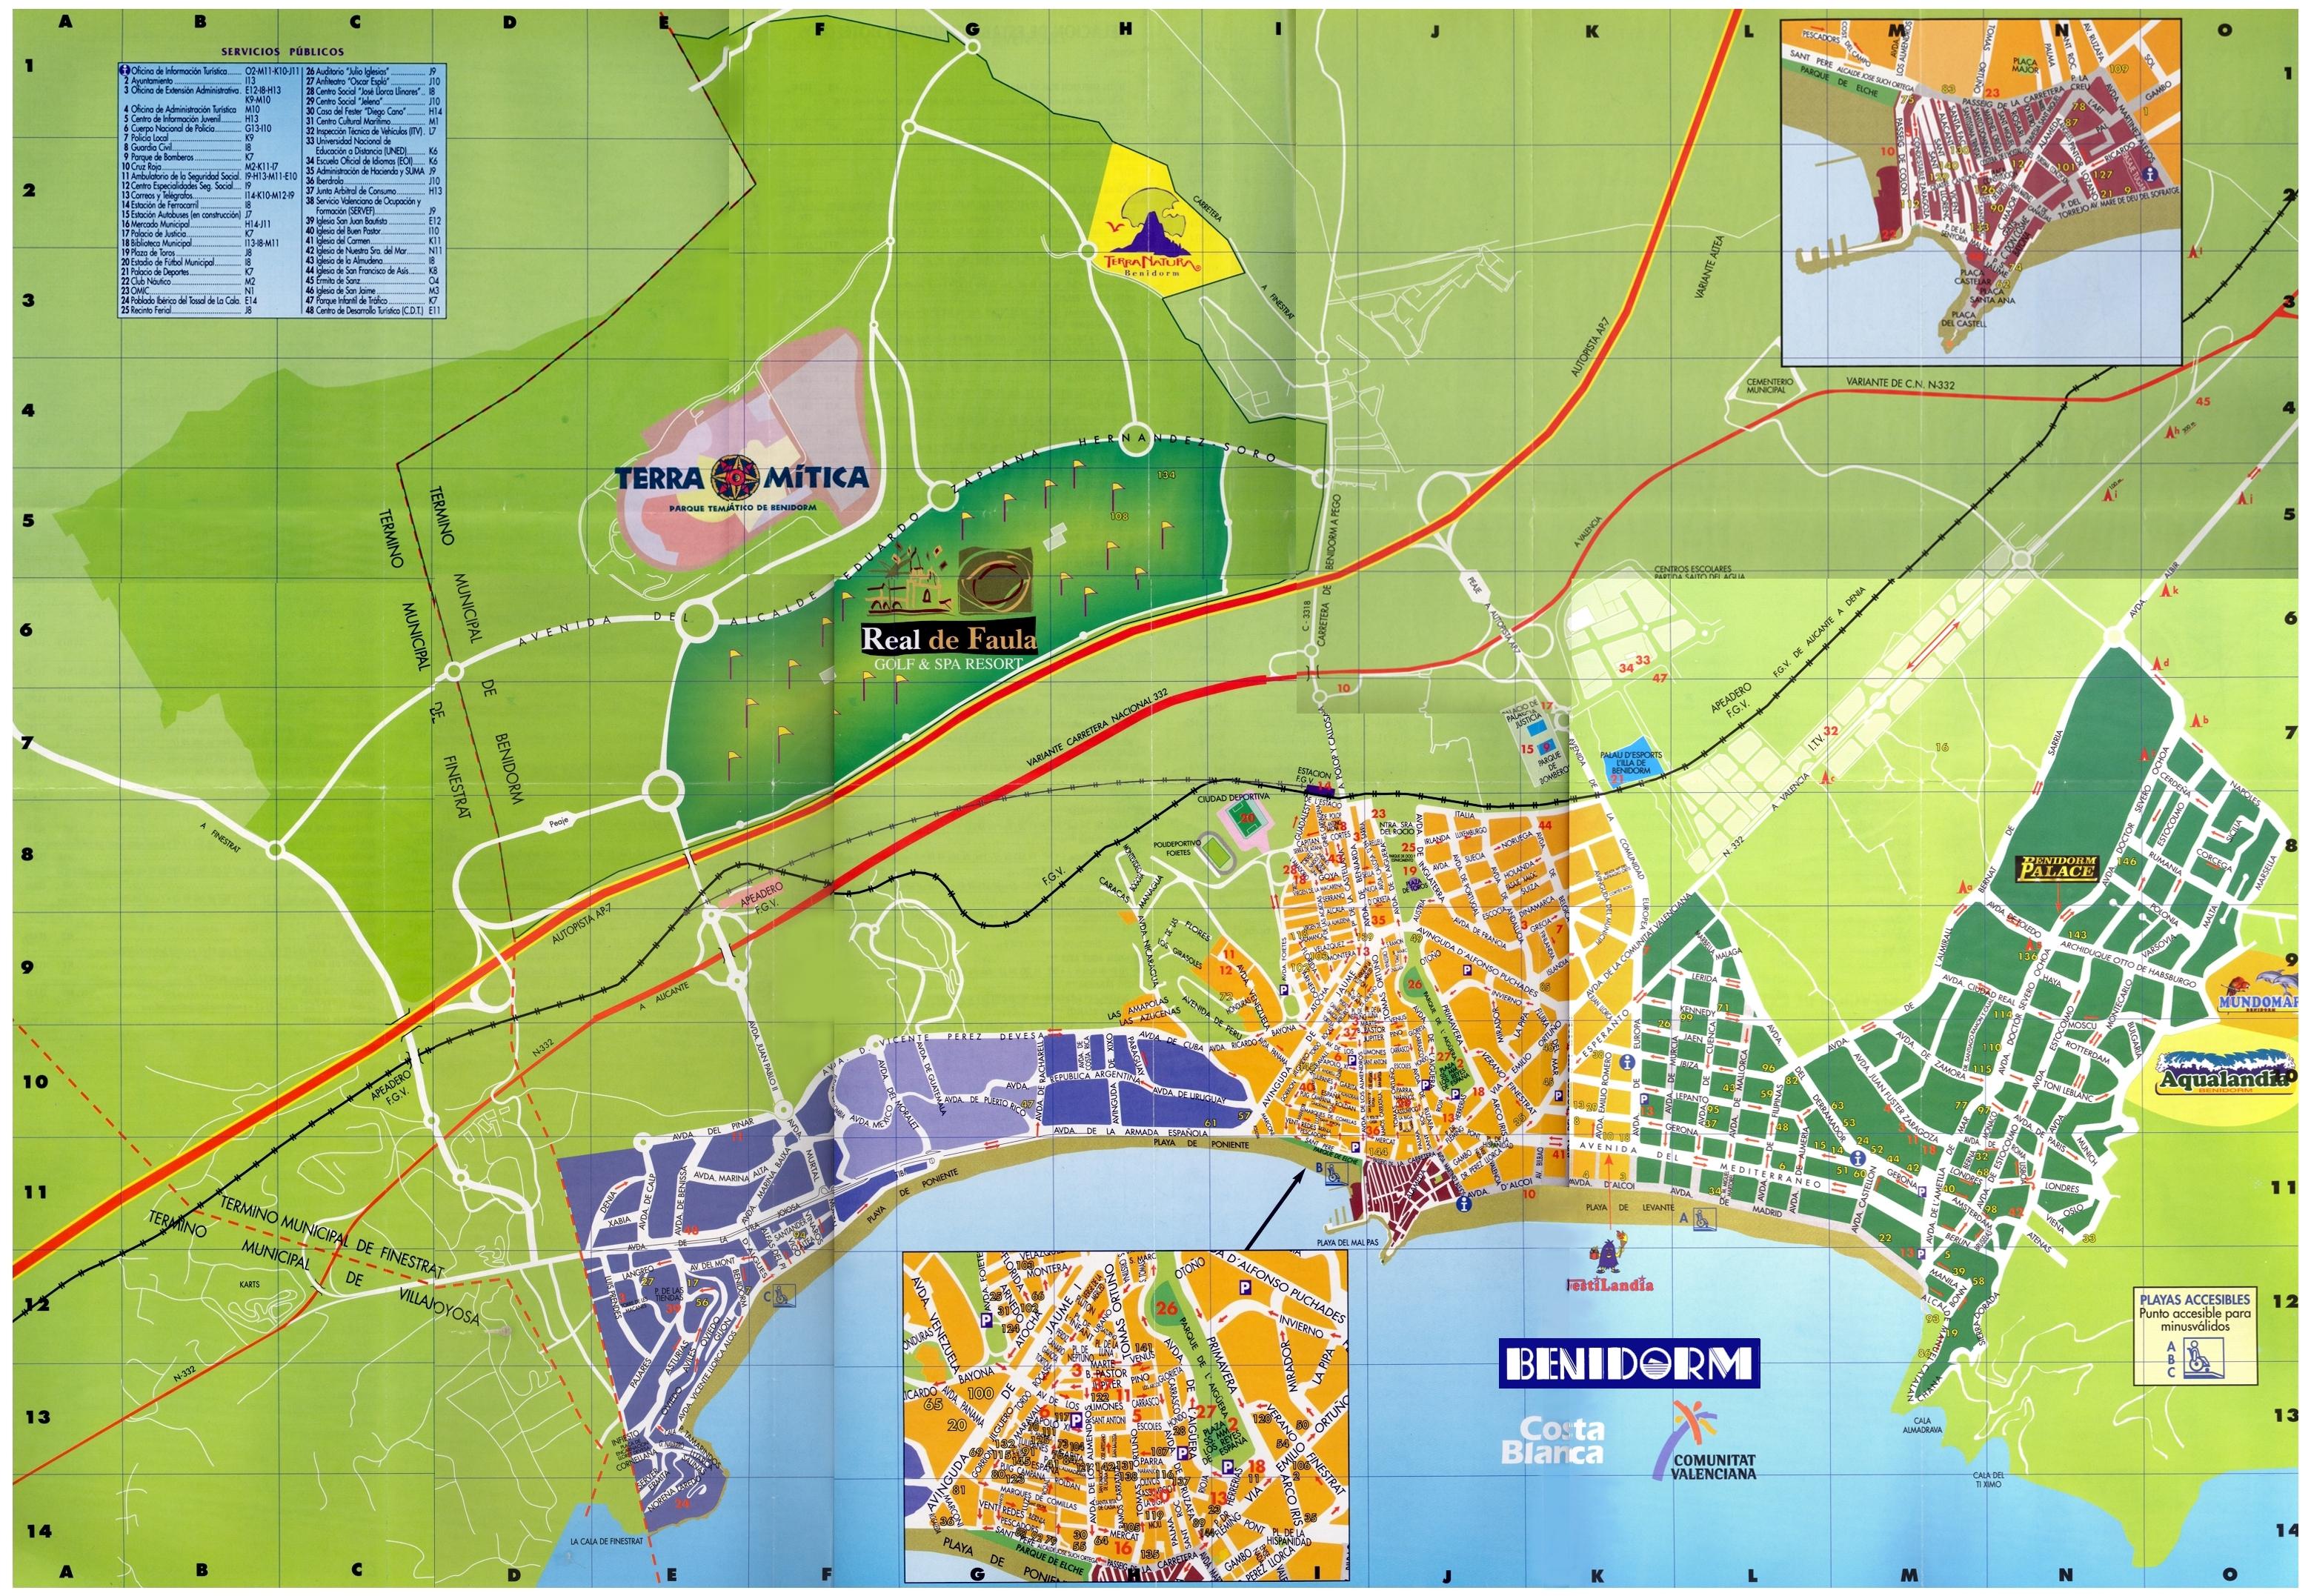 Mapa turístico de Benidorm